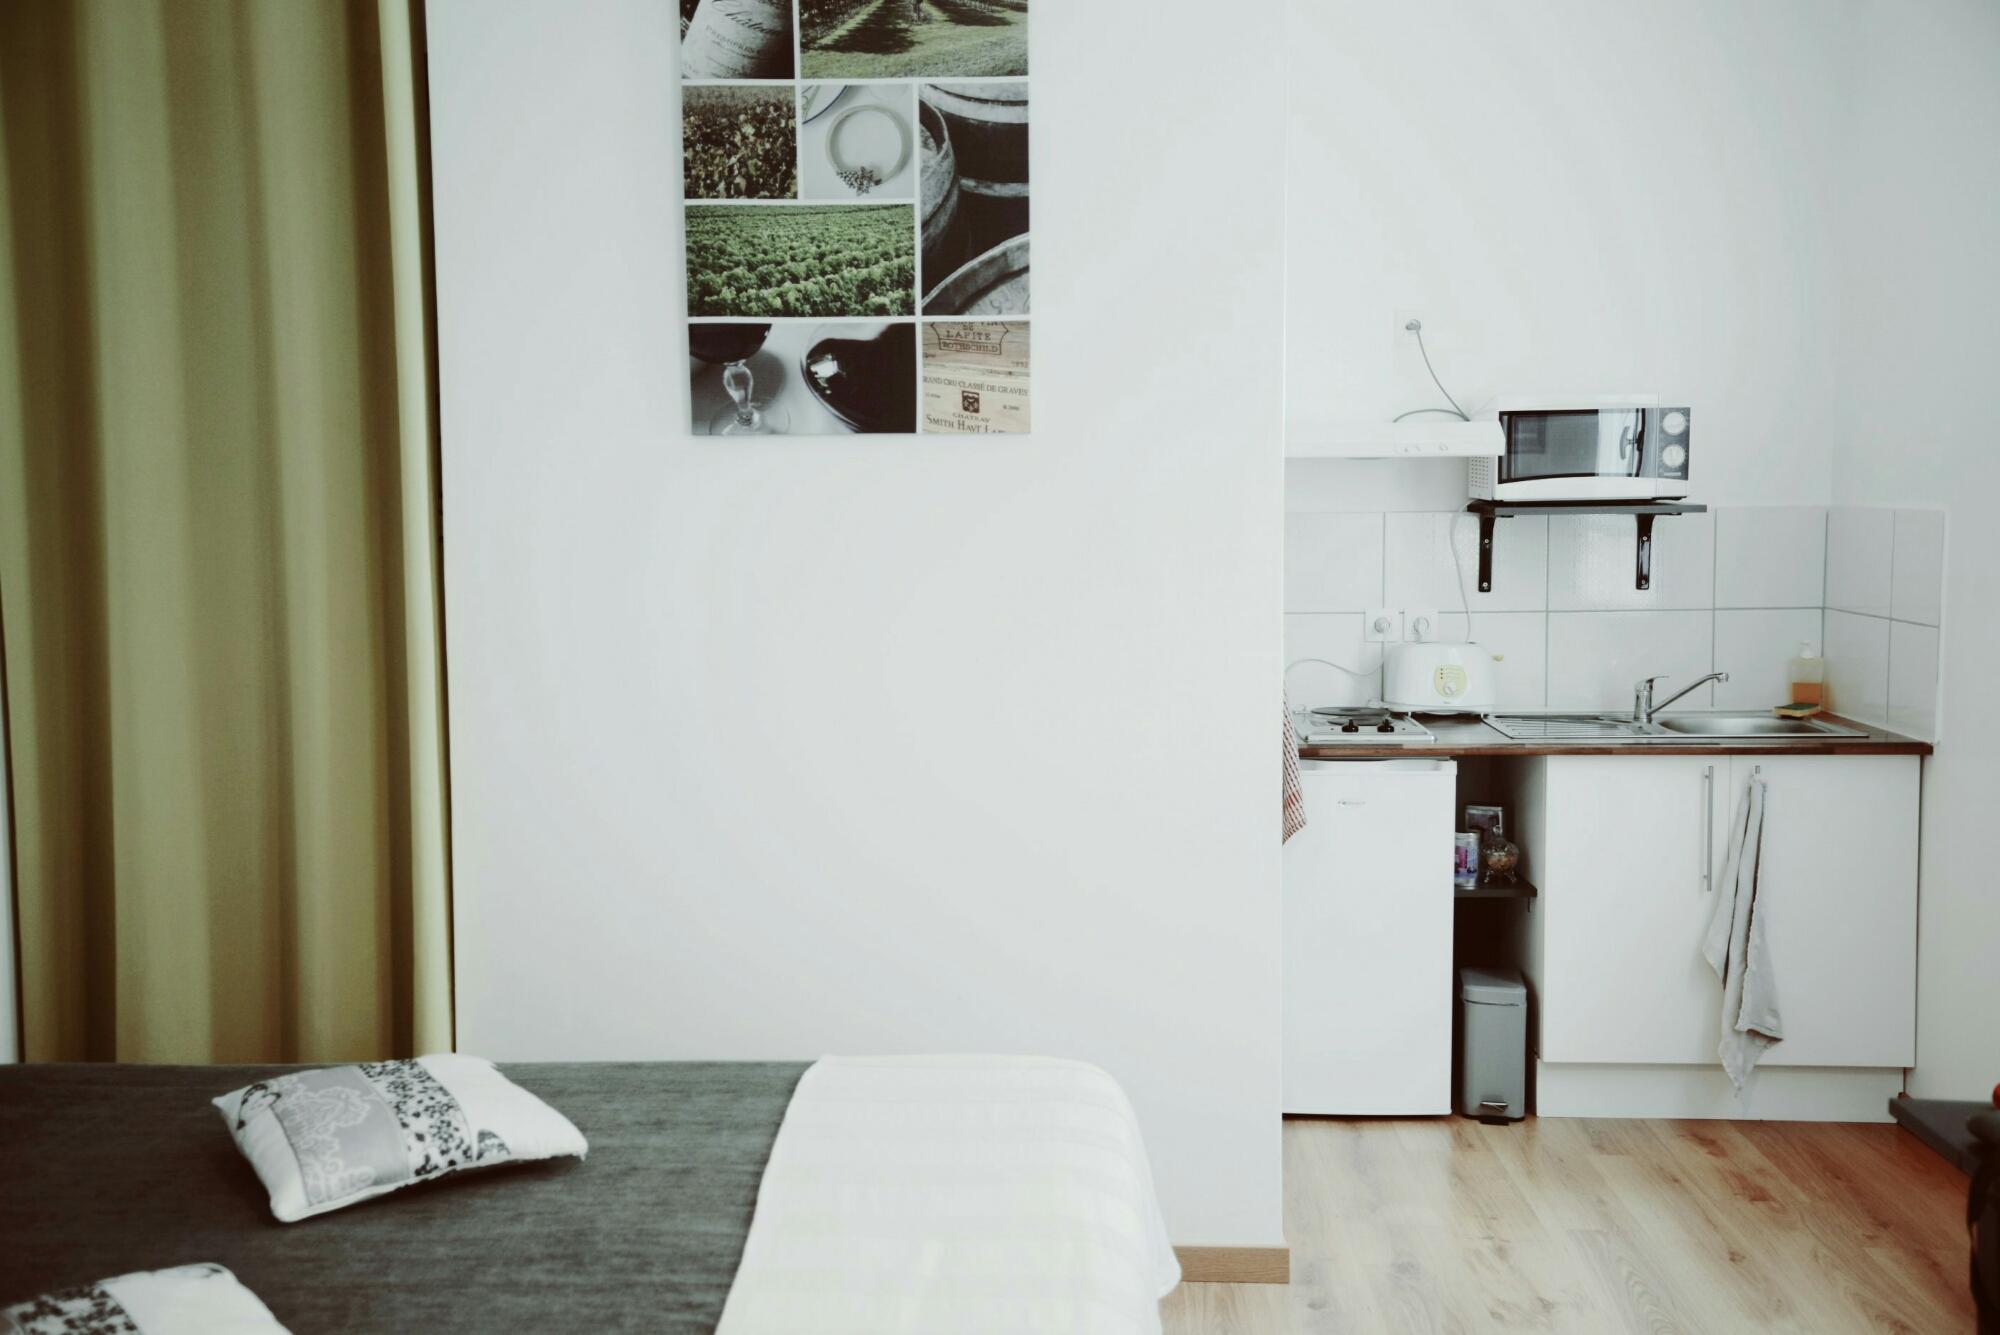 Appartement in Bordeaux